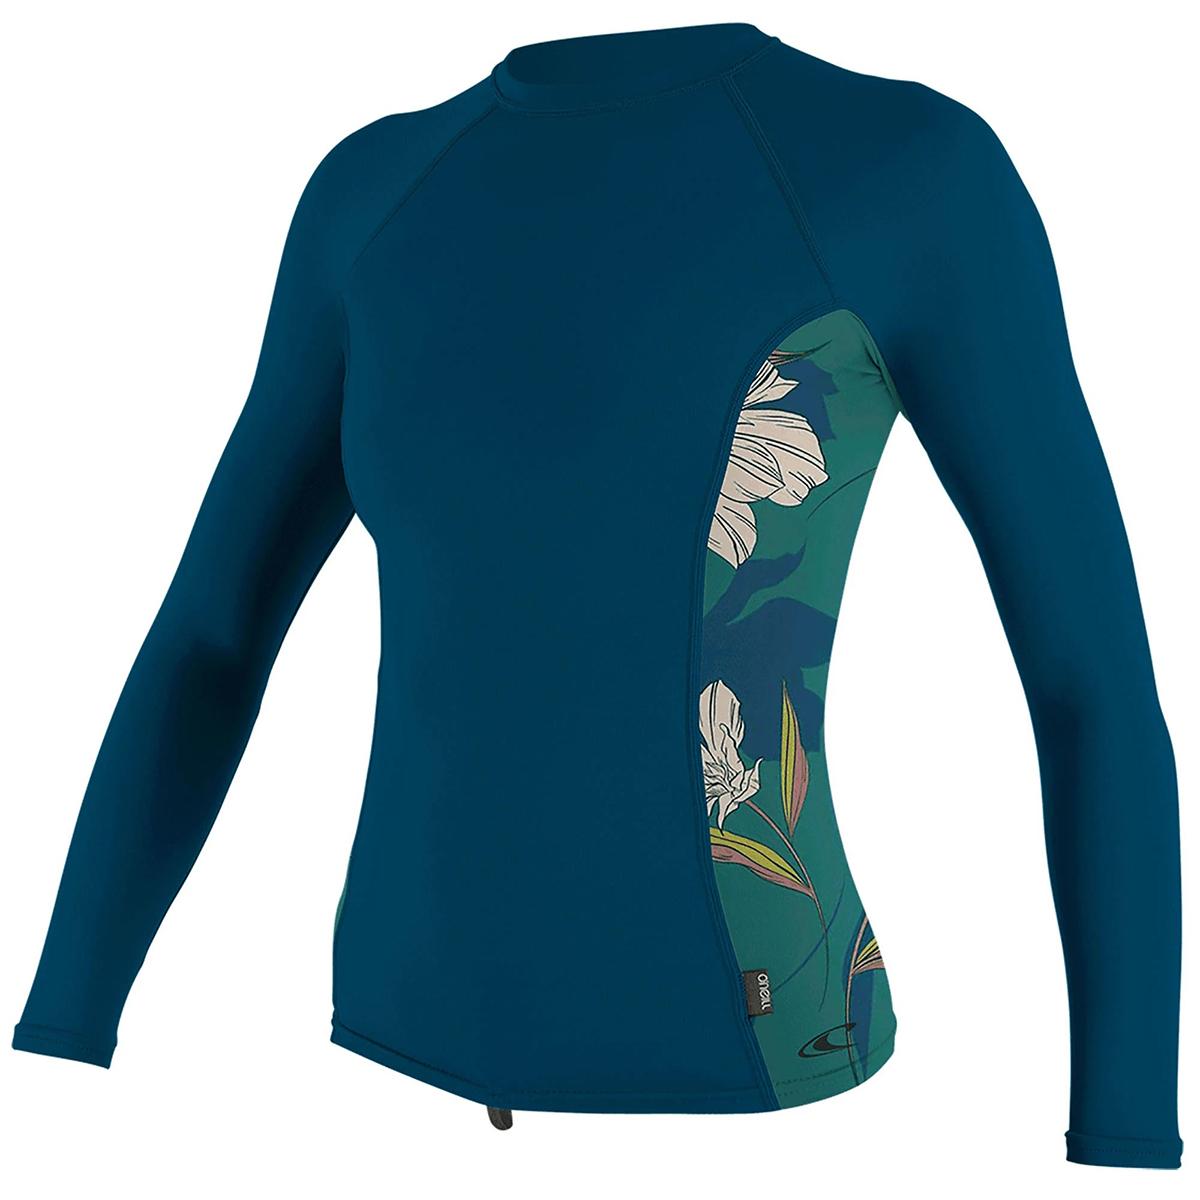 O'neill Women's Rashguard Long-Sleeve Shirt - Blue, L